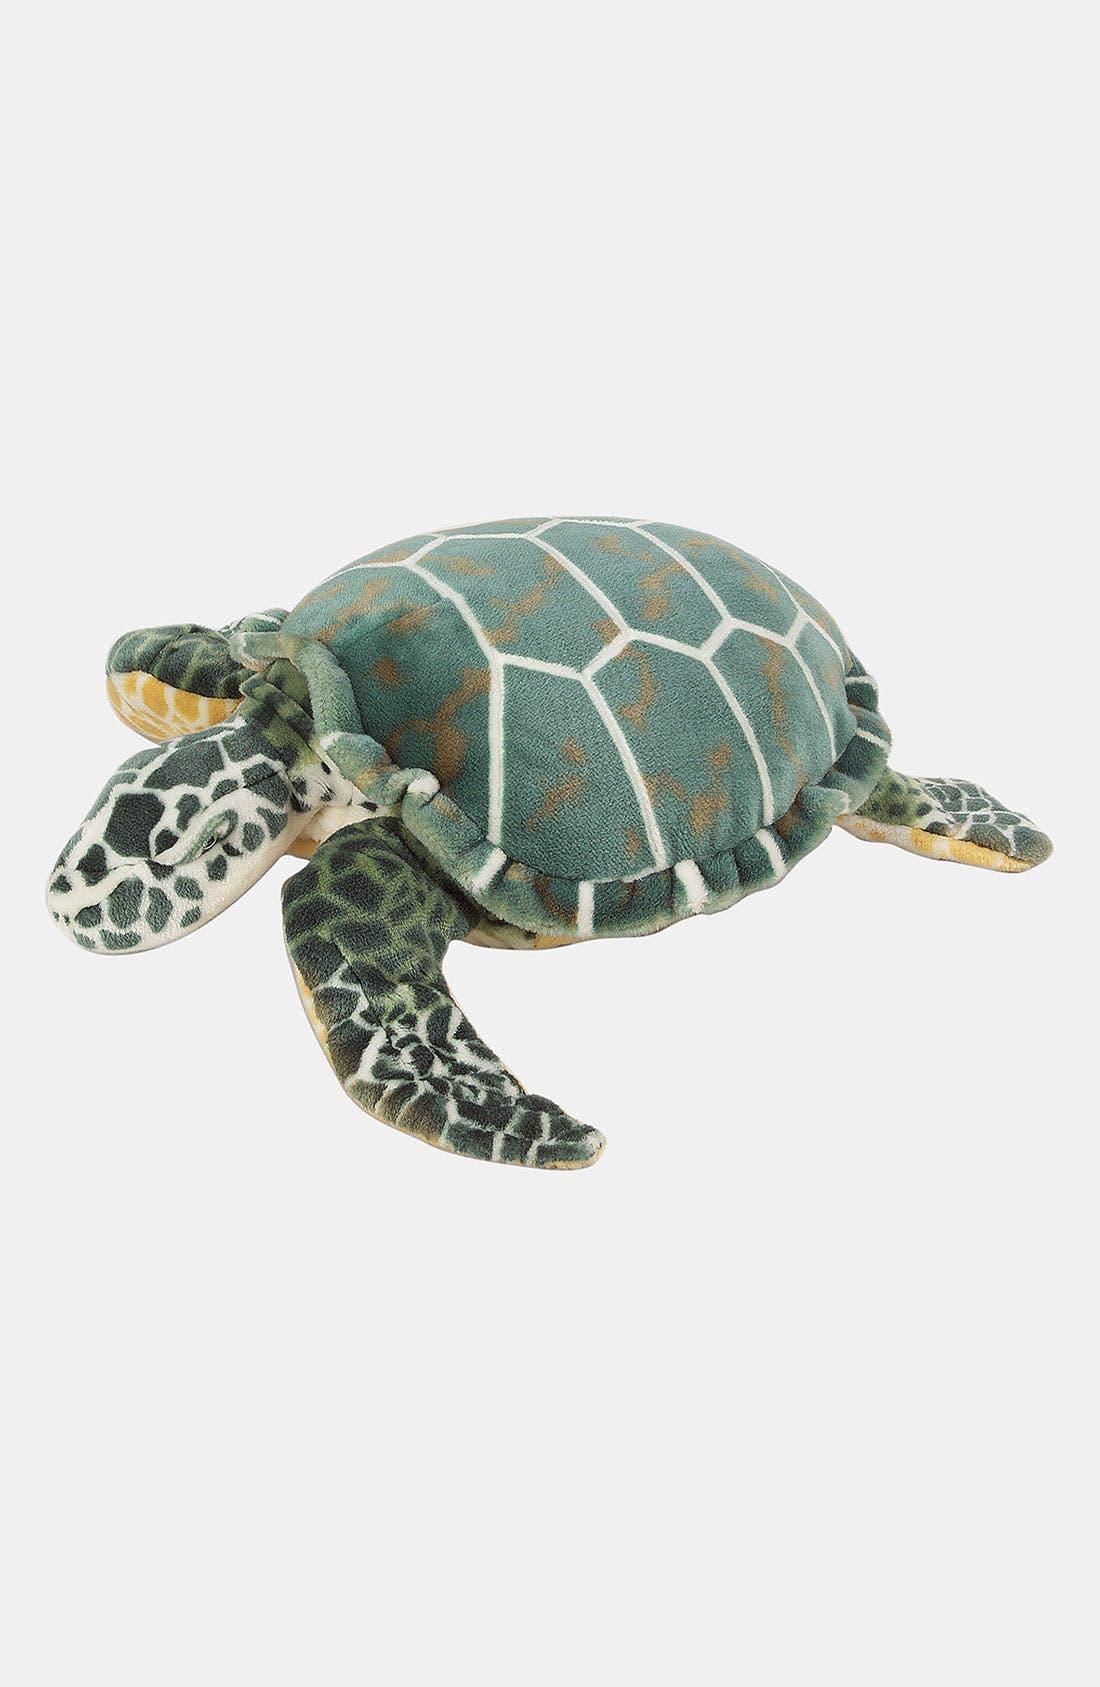 Alternate Image 1 Selected - Melissa & Doug Oversized Plush Stuffed Sea Turtle